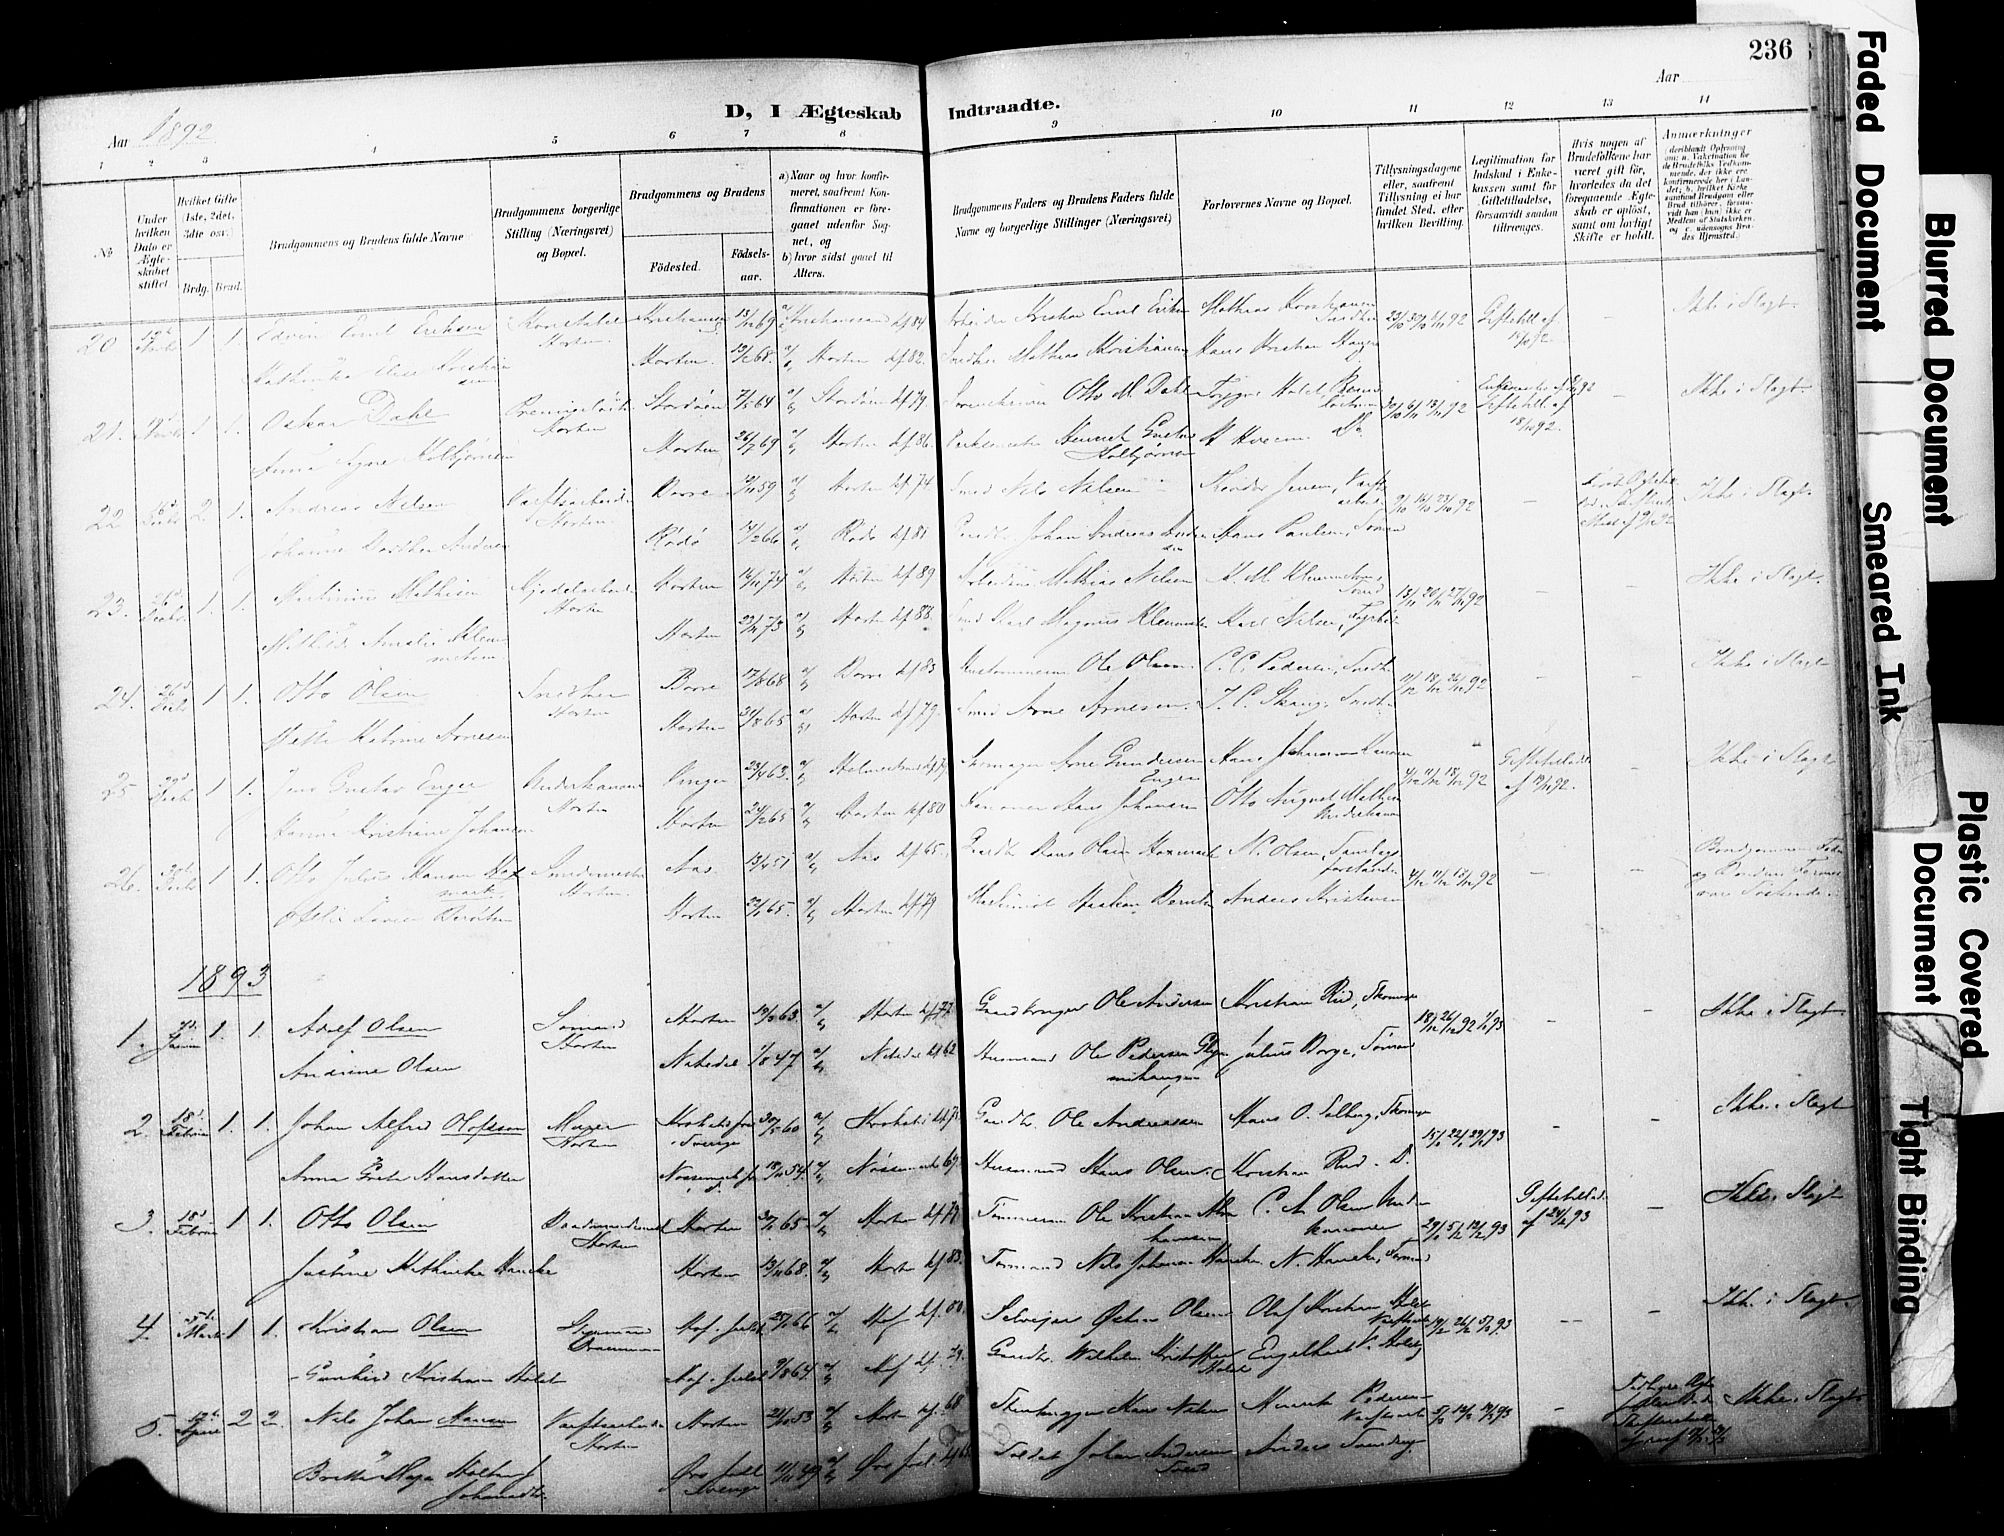 SAKO, Horten kirkebøker, F/Fa/L0004: Parish register (official) no. 4, 1888-1895, p. 236